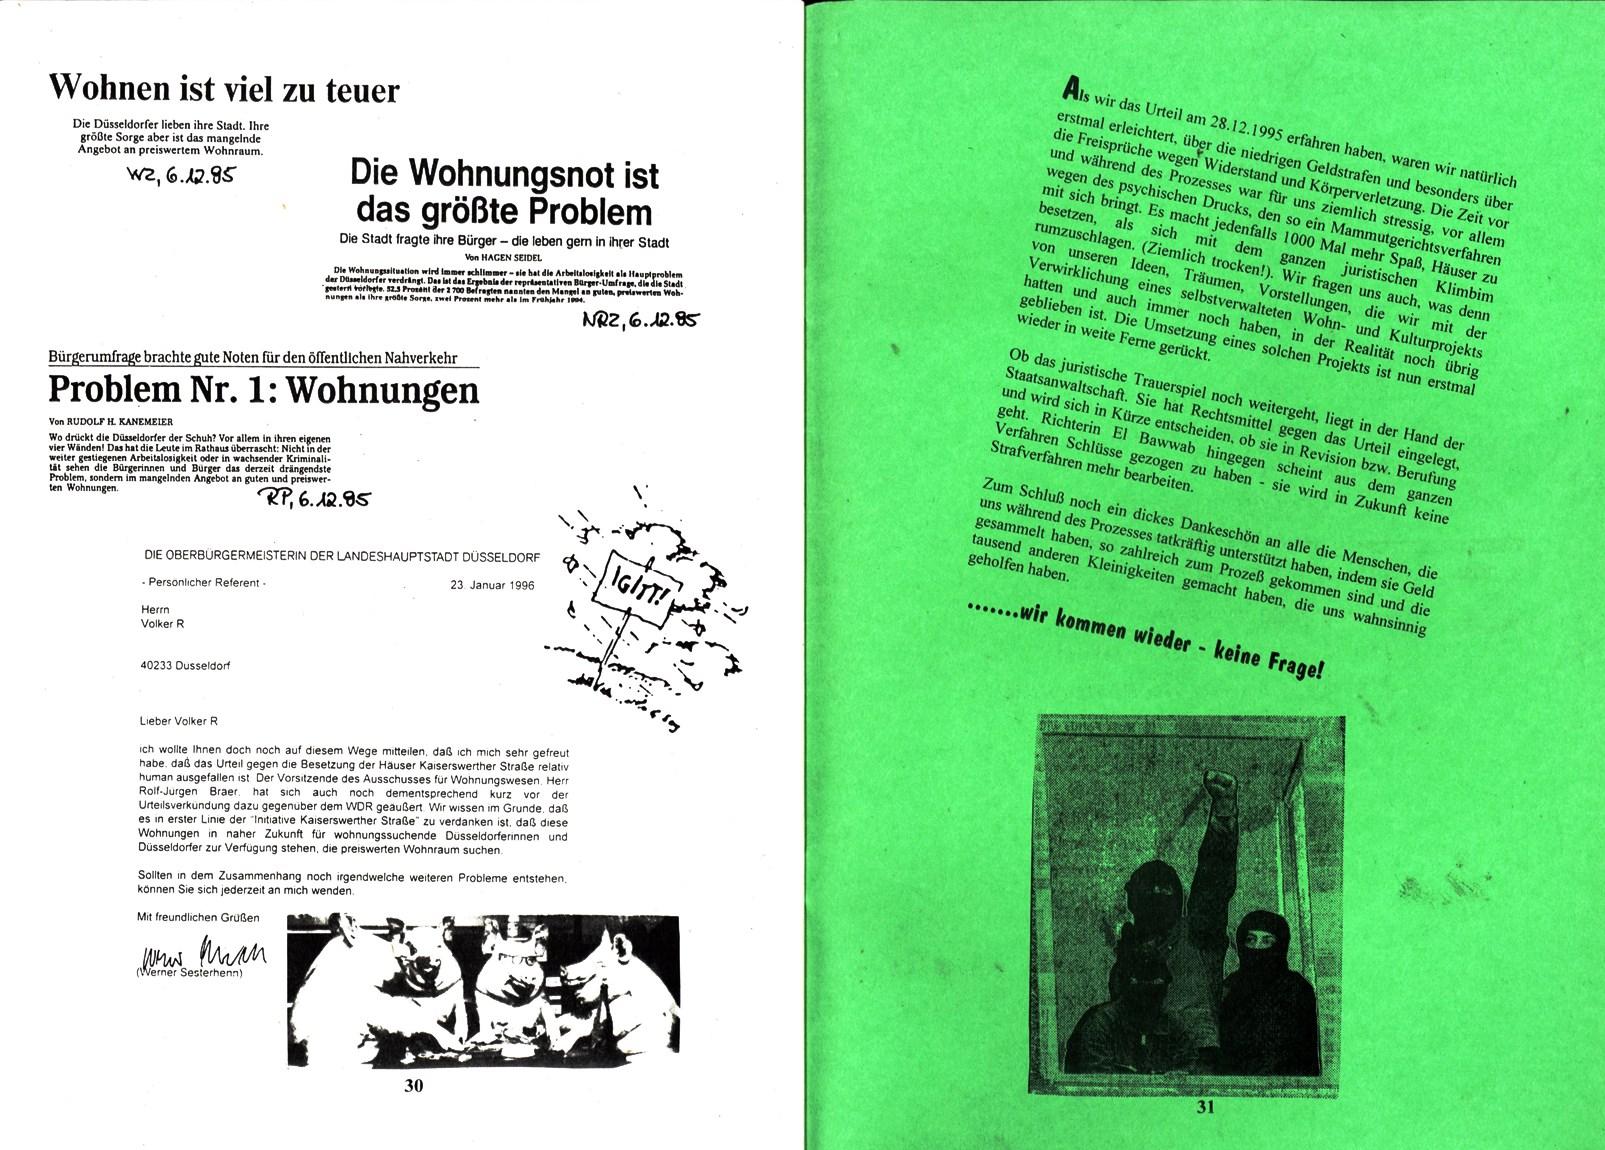 Duesseldorf_1996_Kaiserswertherstrasse_16